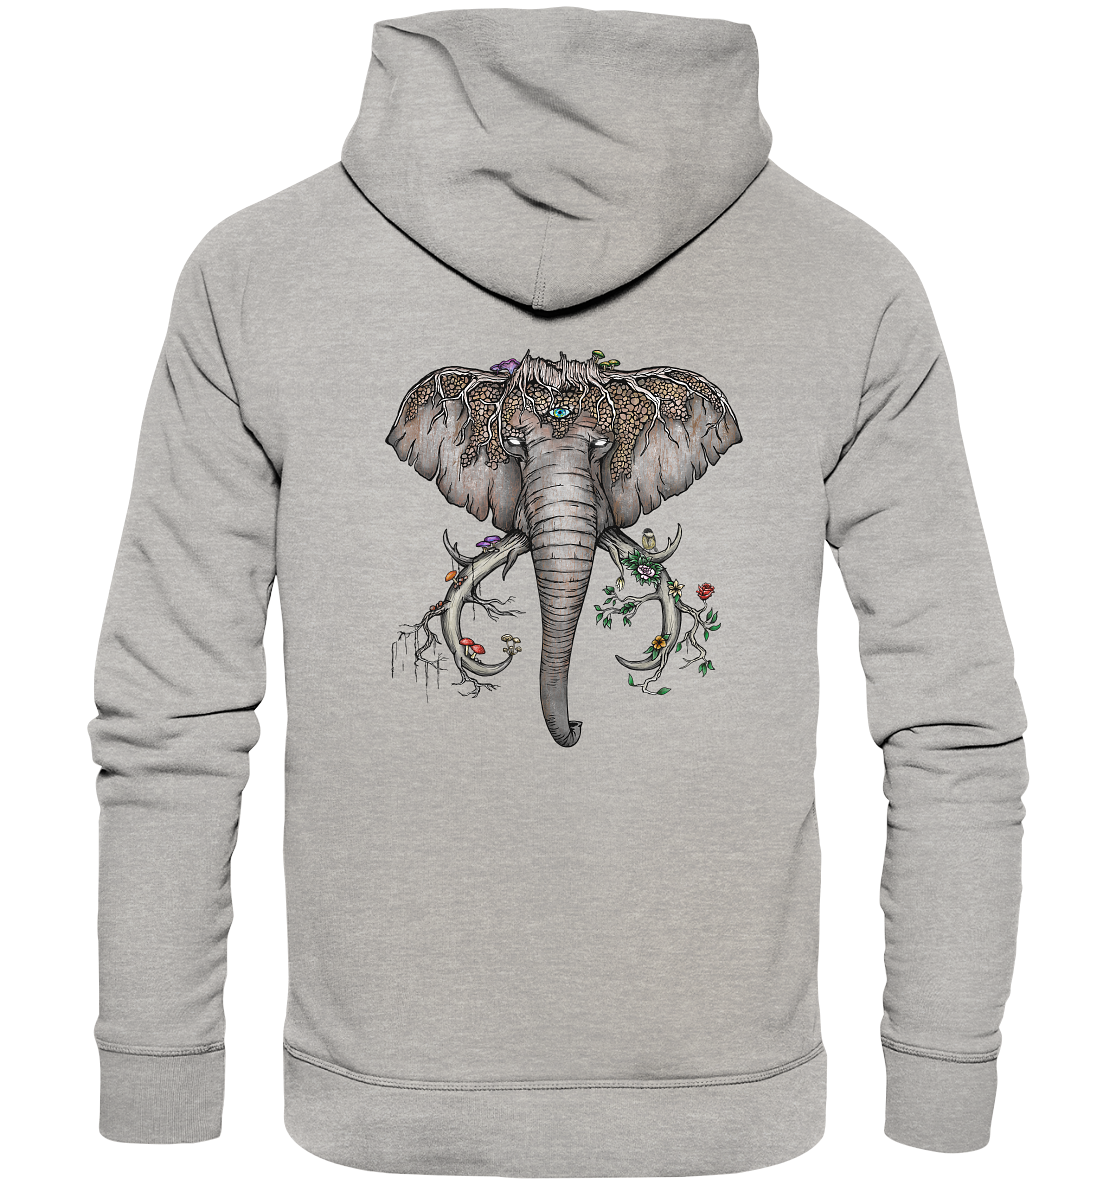 back-organic-hoodie-c2c1c0-1116x-1.png